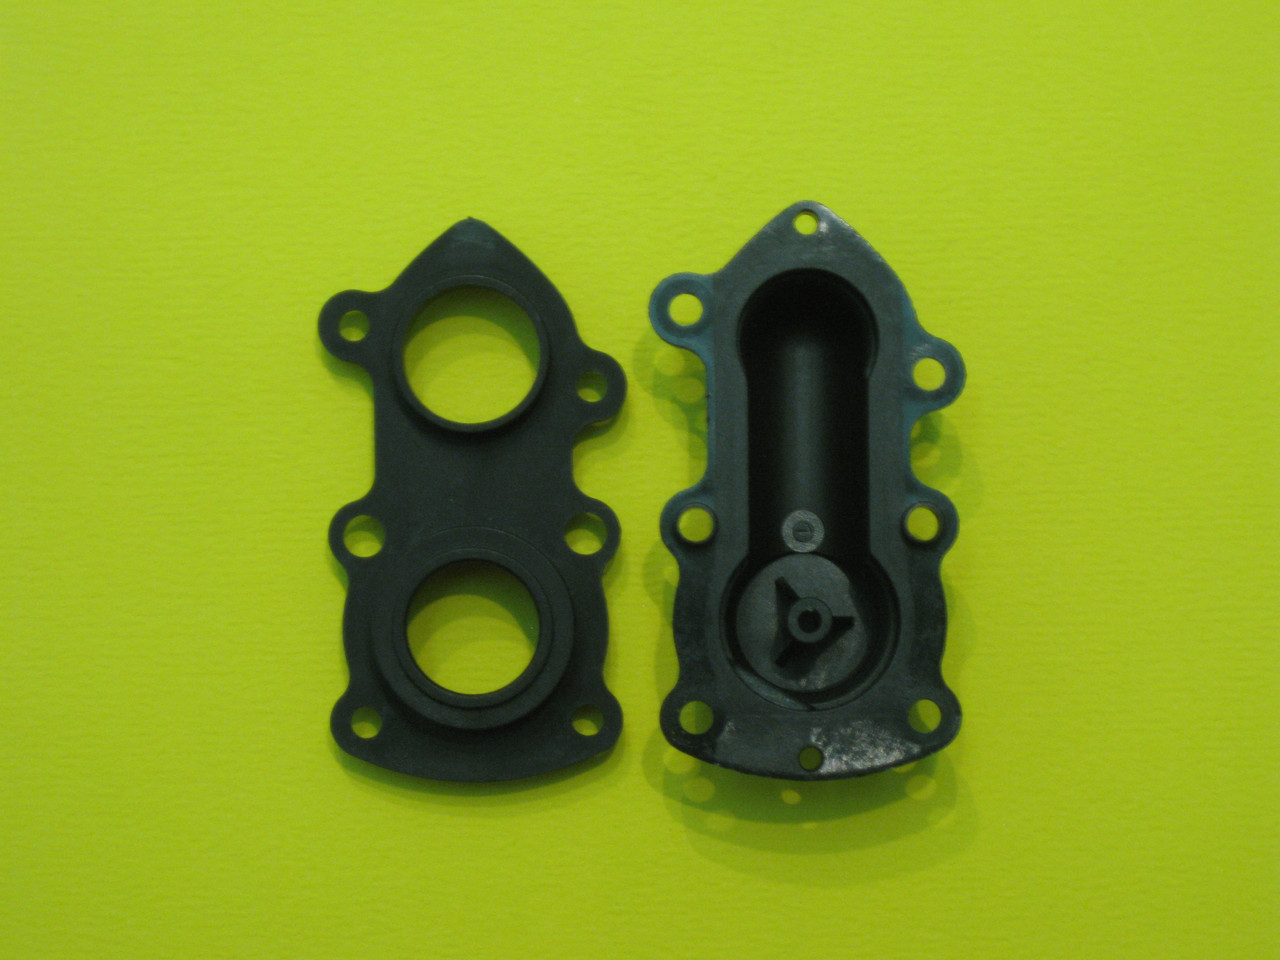 Задняя пластмассовая часть гидроблока 3003201631 (D003201631) Demrad Kalisto Mono HK (BK) - B -124 / 130 D , фото 2